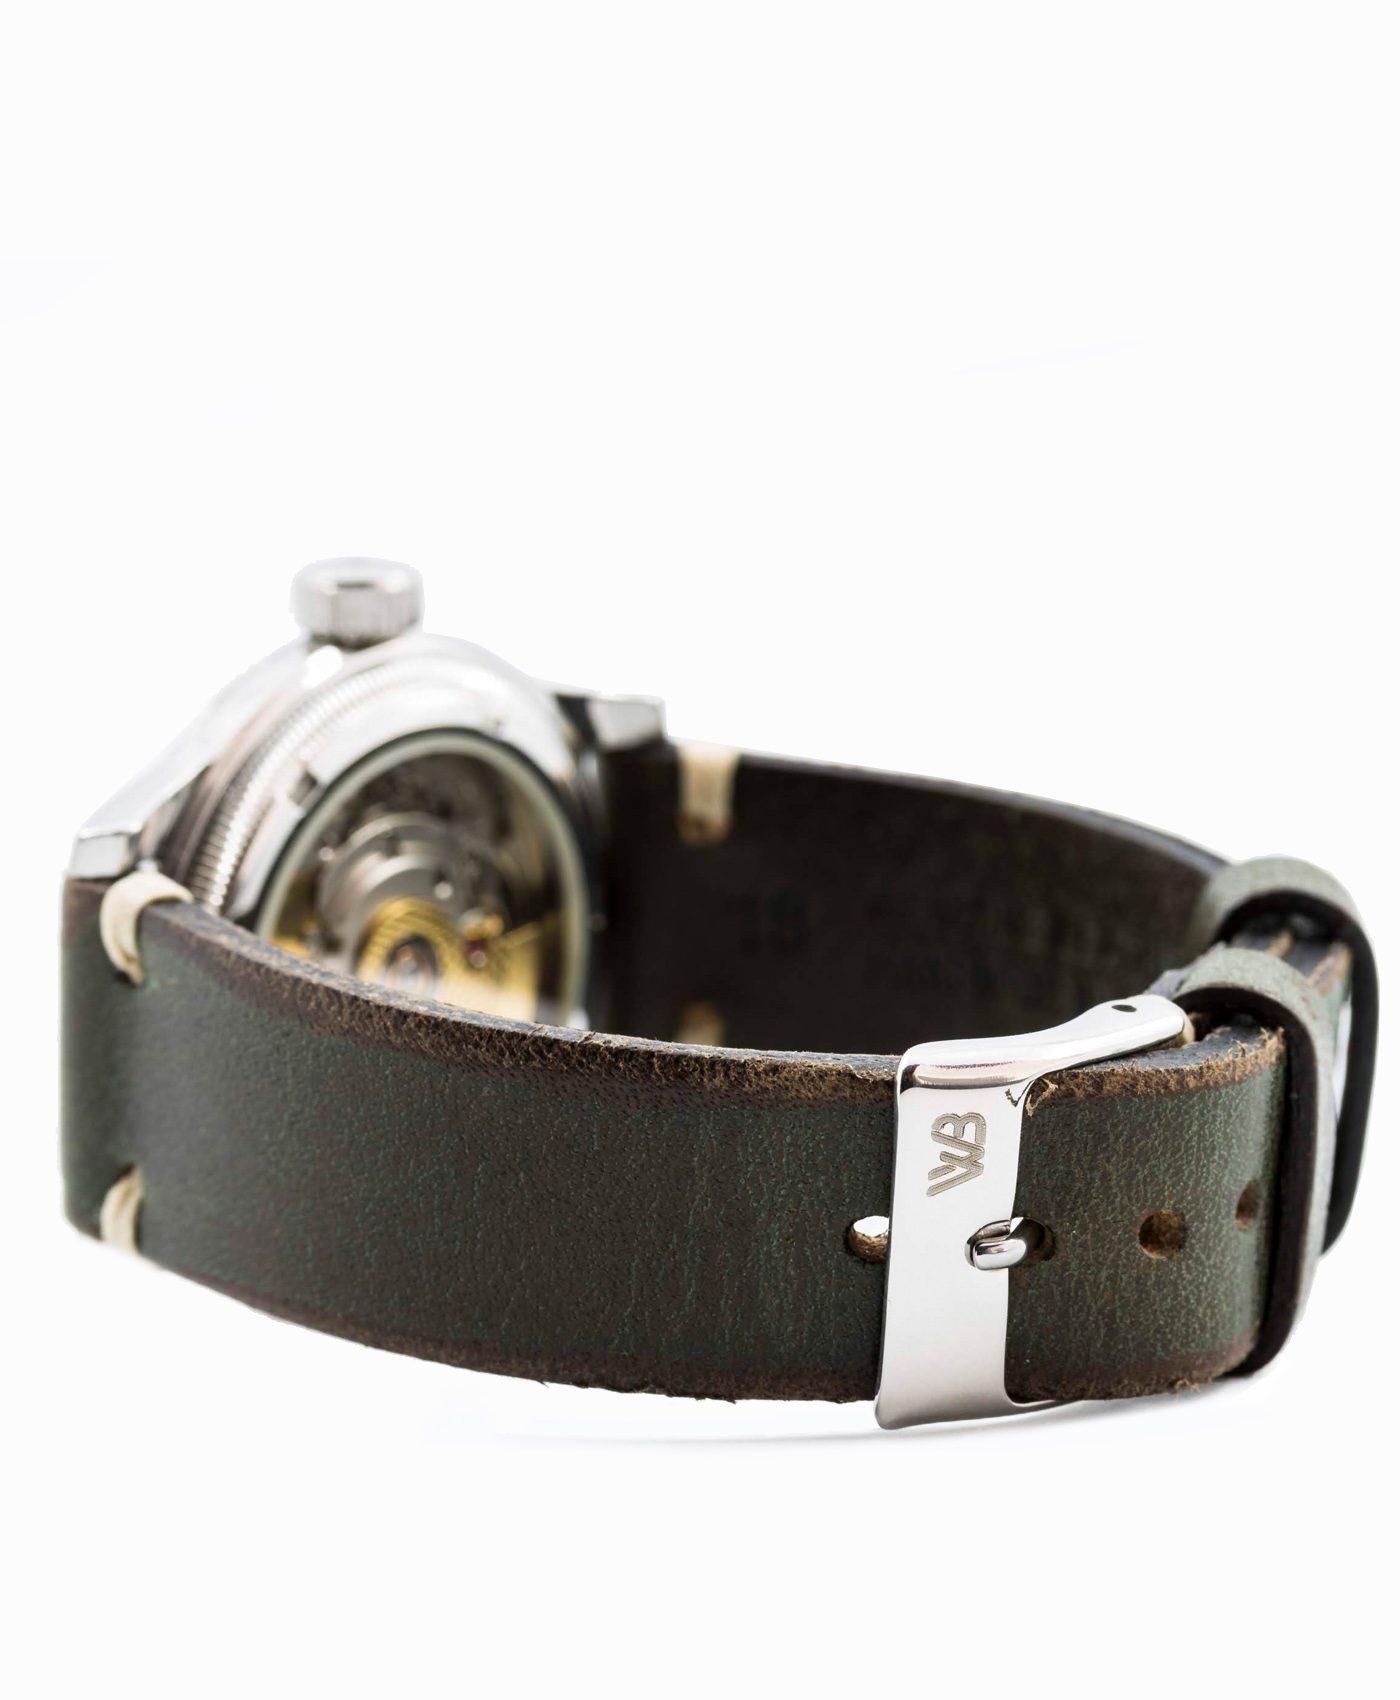 Oris_watch_strap__vintage_leather_military_green_watchbandit_original